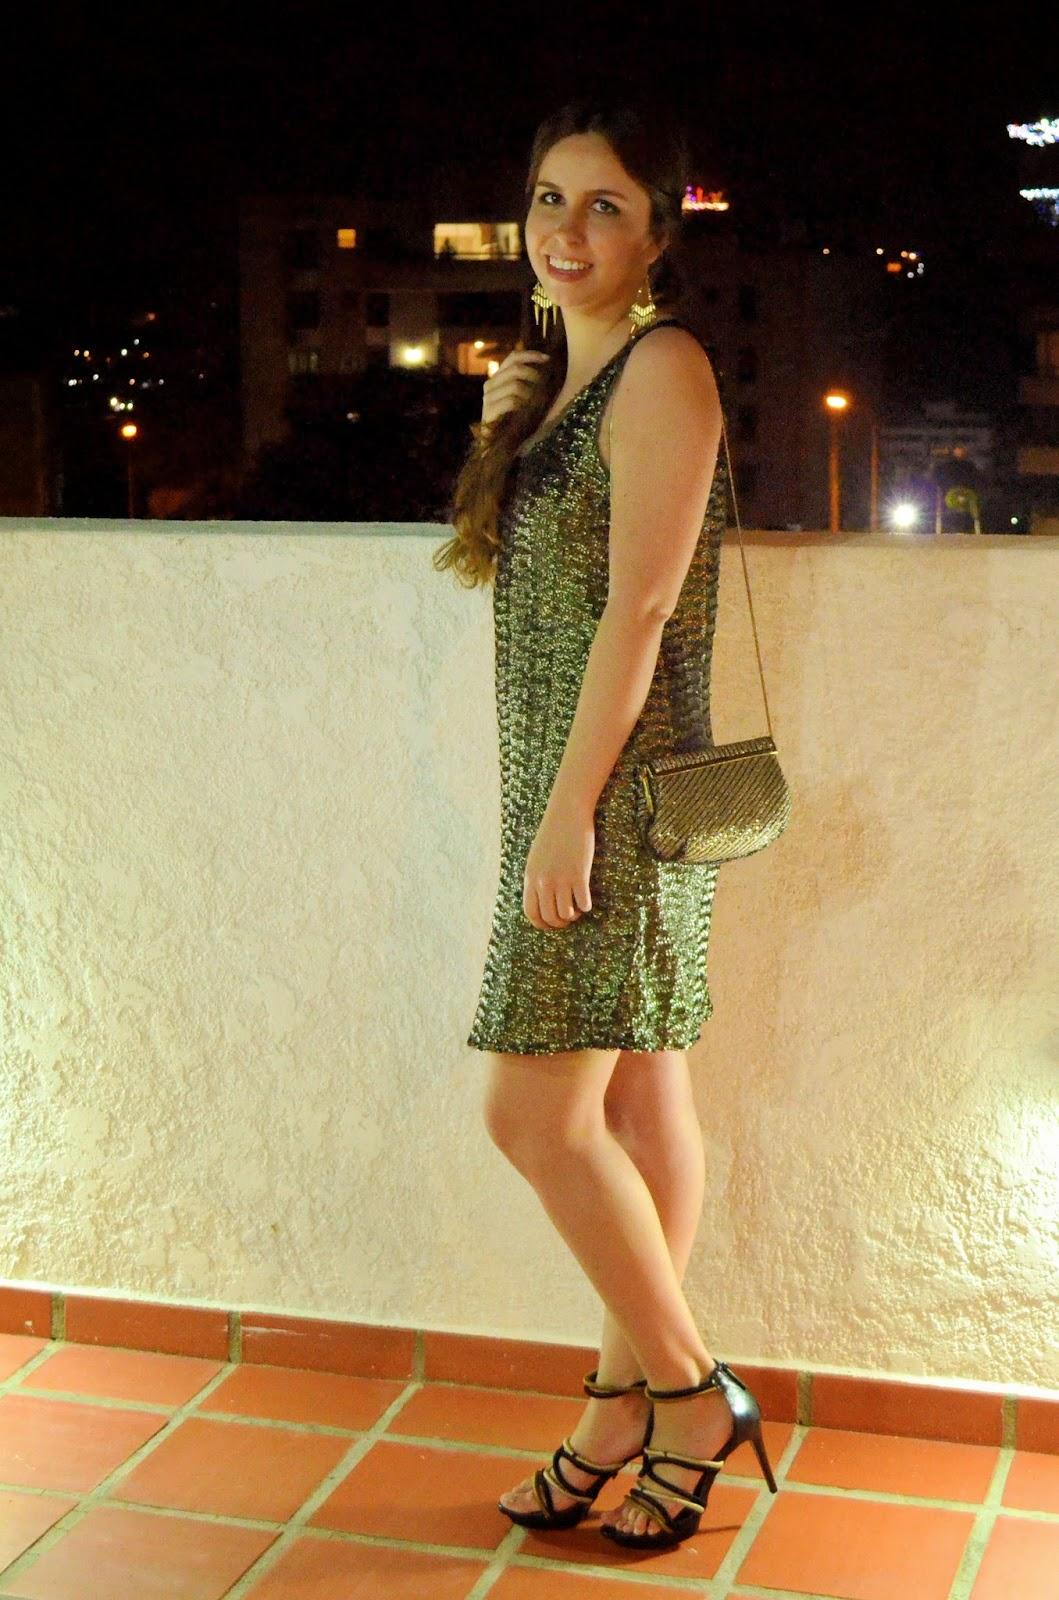 hey vicky hey, victoria suarez, año nuevo, nye, new year's eve, fiesta, blogger